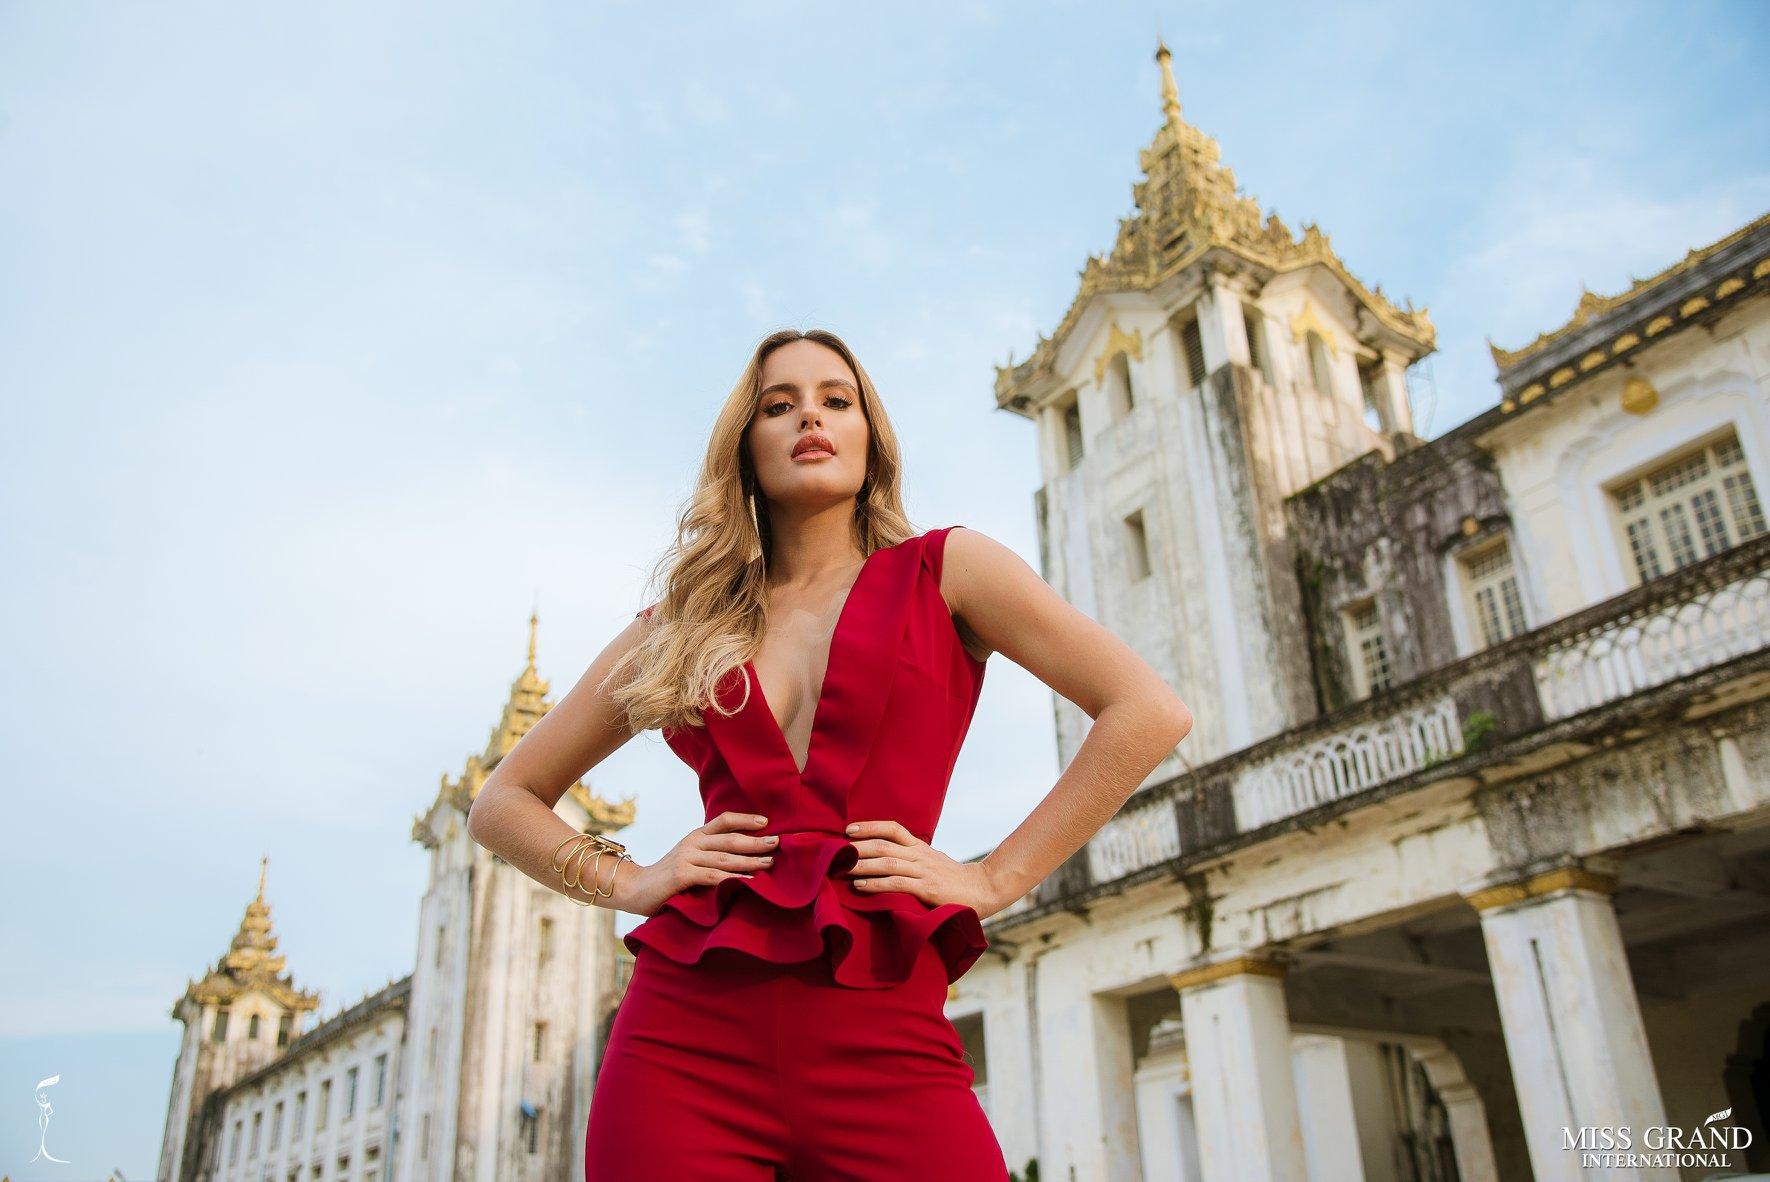 sheyla quizena, miss grand colombia 2018. - Página 4 4vuhaf10